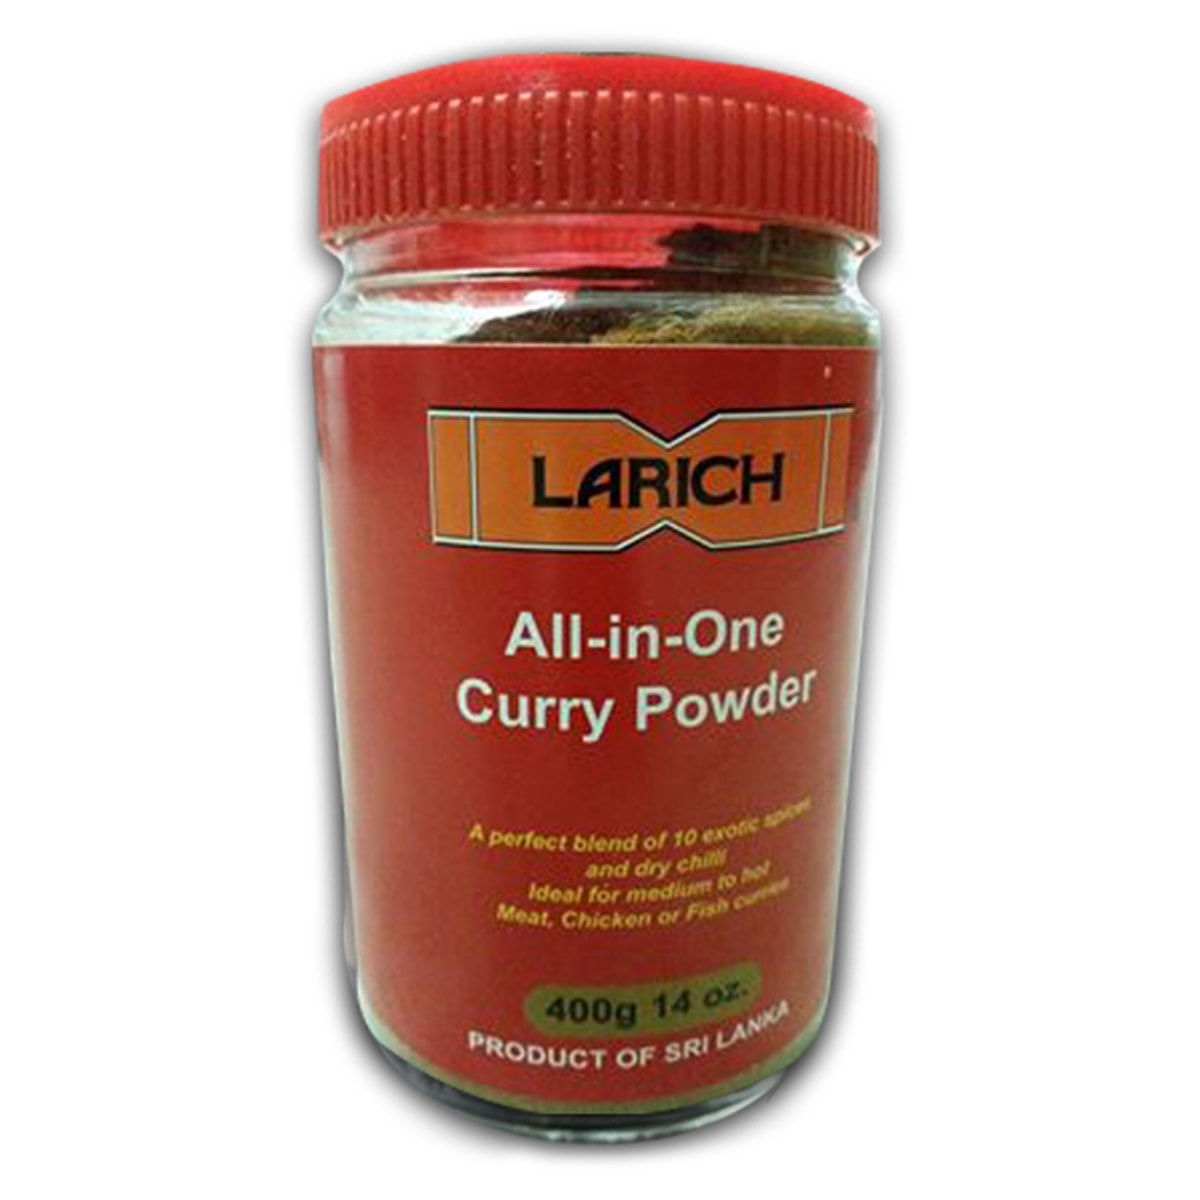 Buy Larich All in One Curry Powder - 400 gm